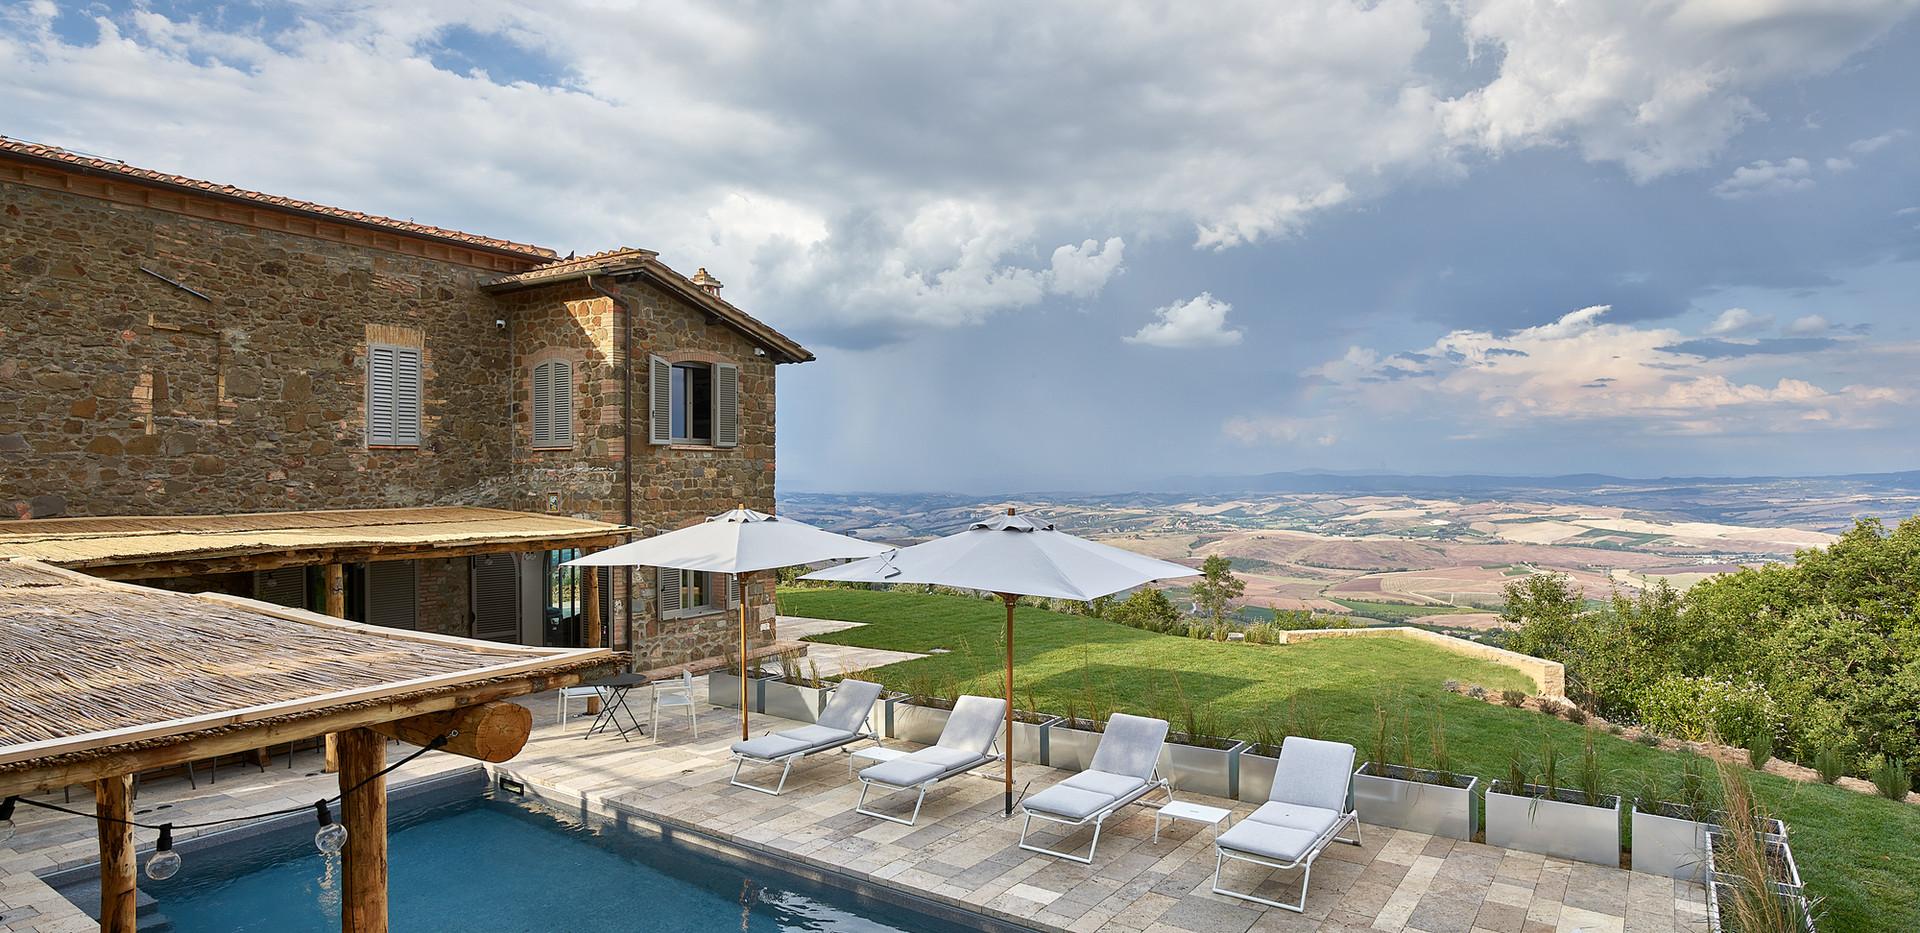 Villa Palazzetta-Aug 2018-0056.jpg